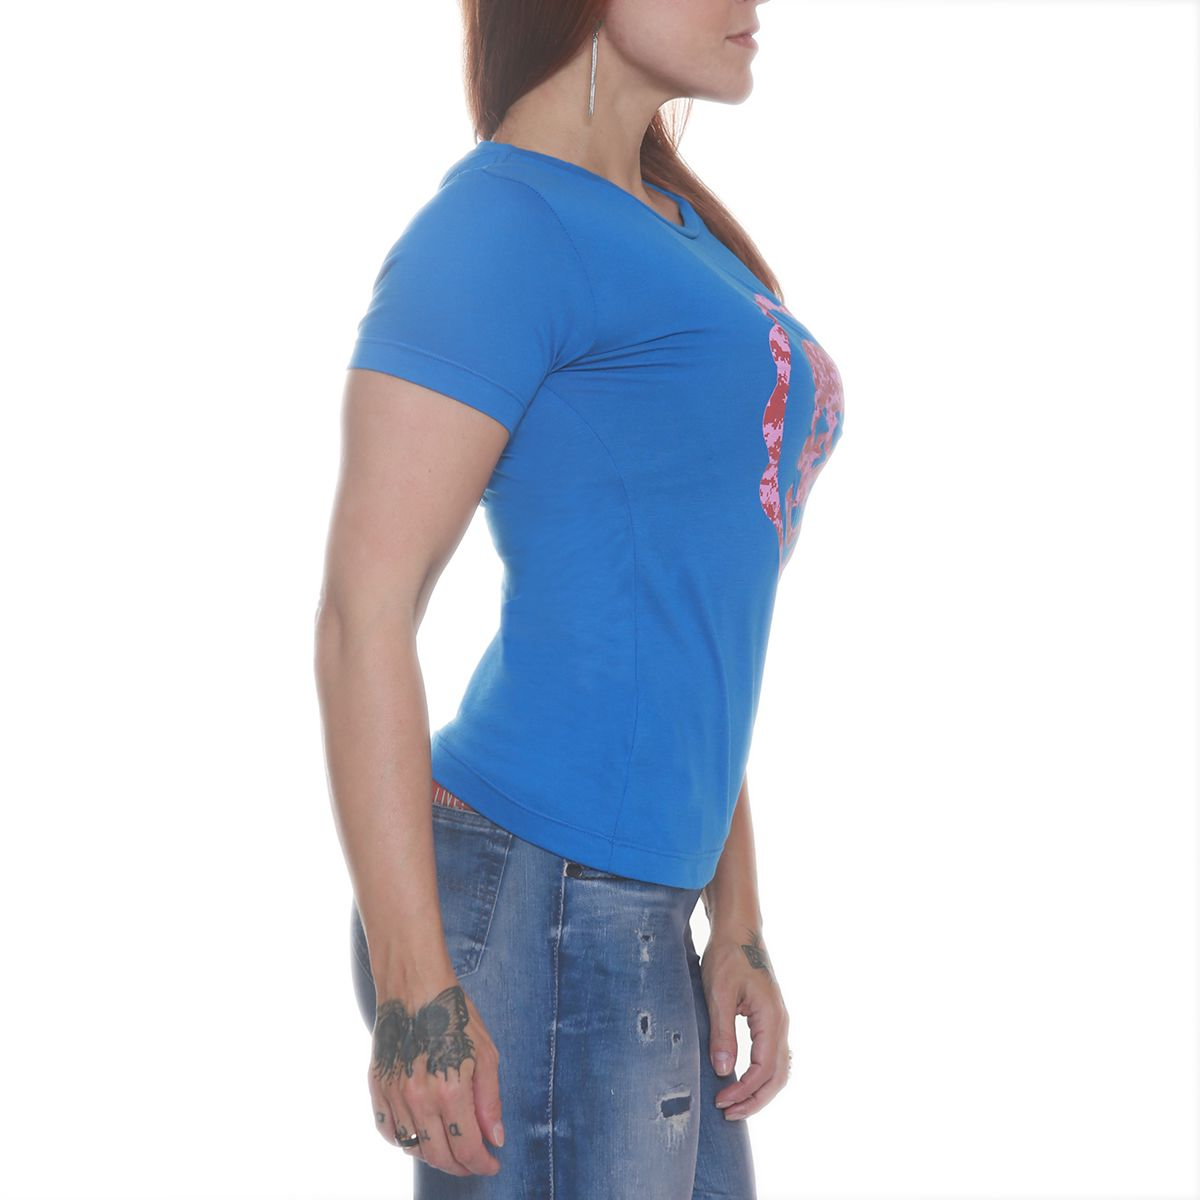 Camiseta Heart Bkf0103 Azul - Black Skull